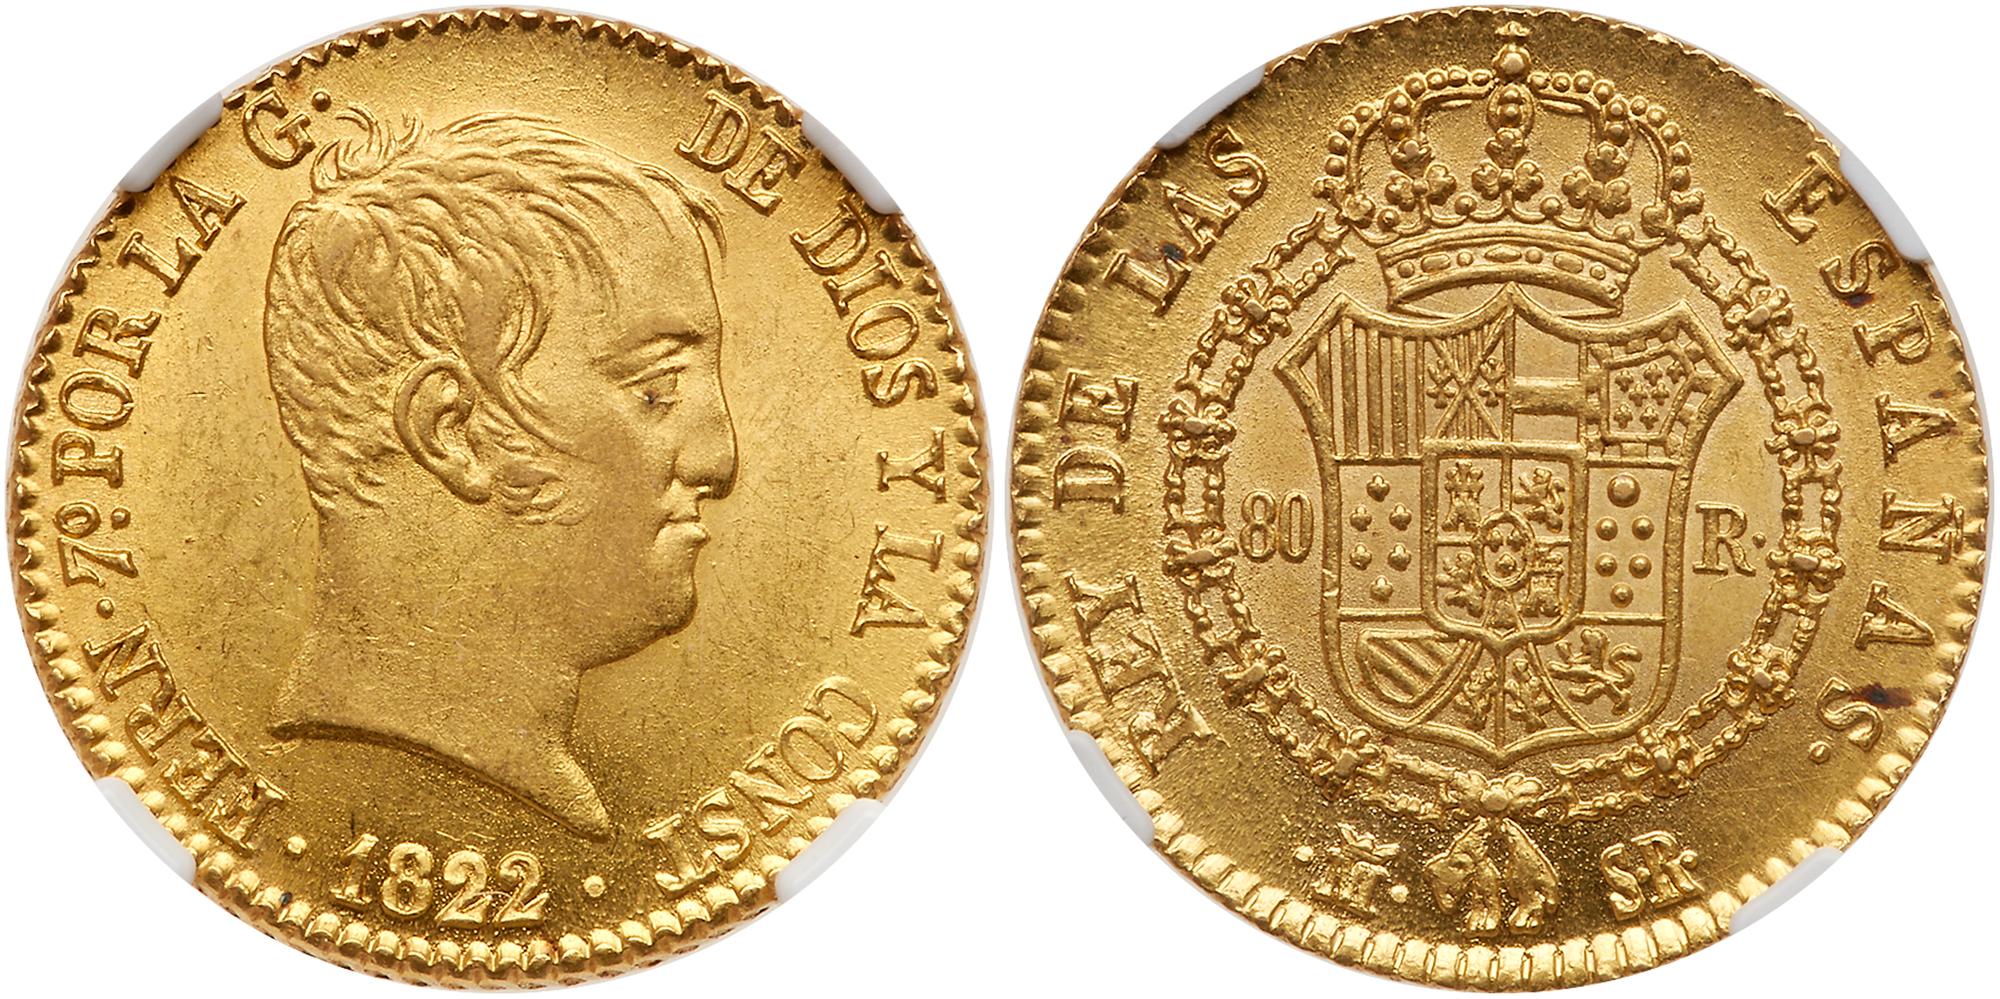 Lot 1895 - Spain. 80 Reales, 1822-SR (Madrid). NGC MS63